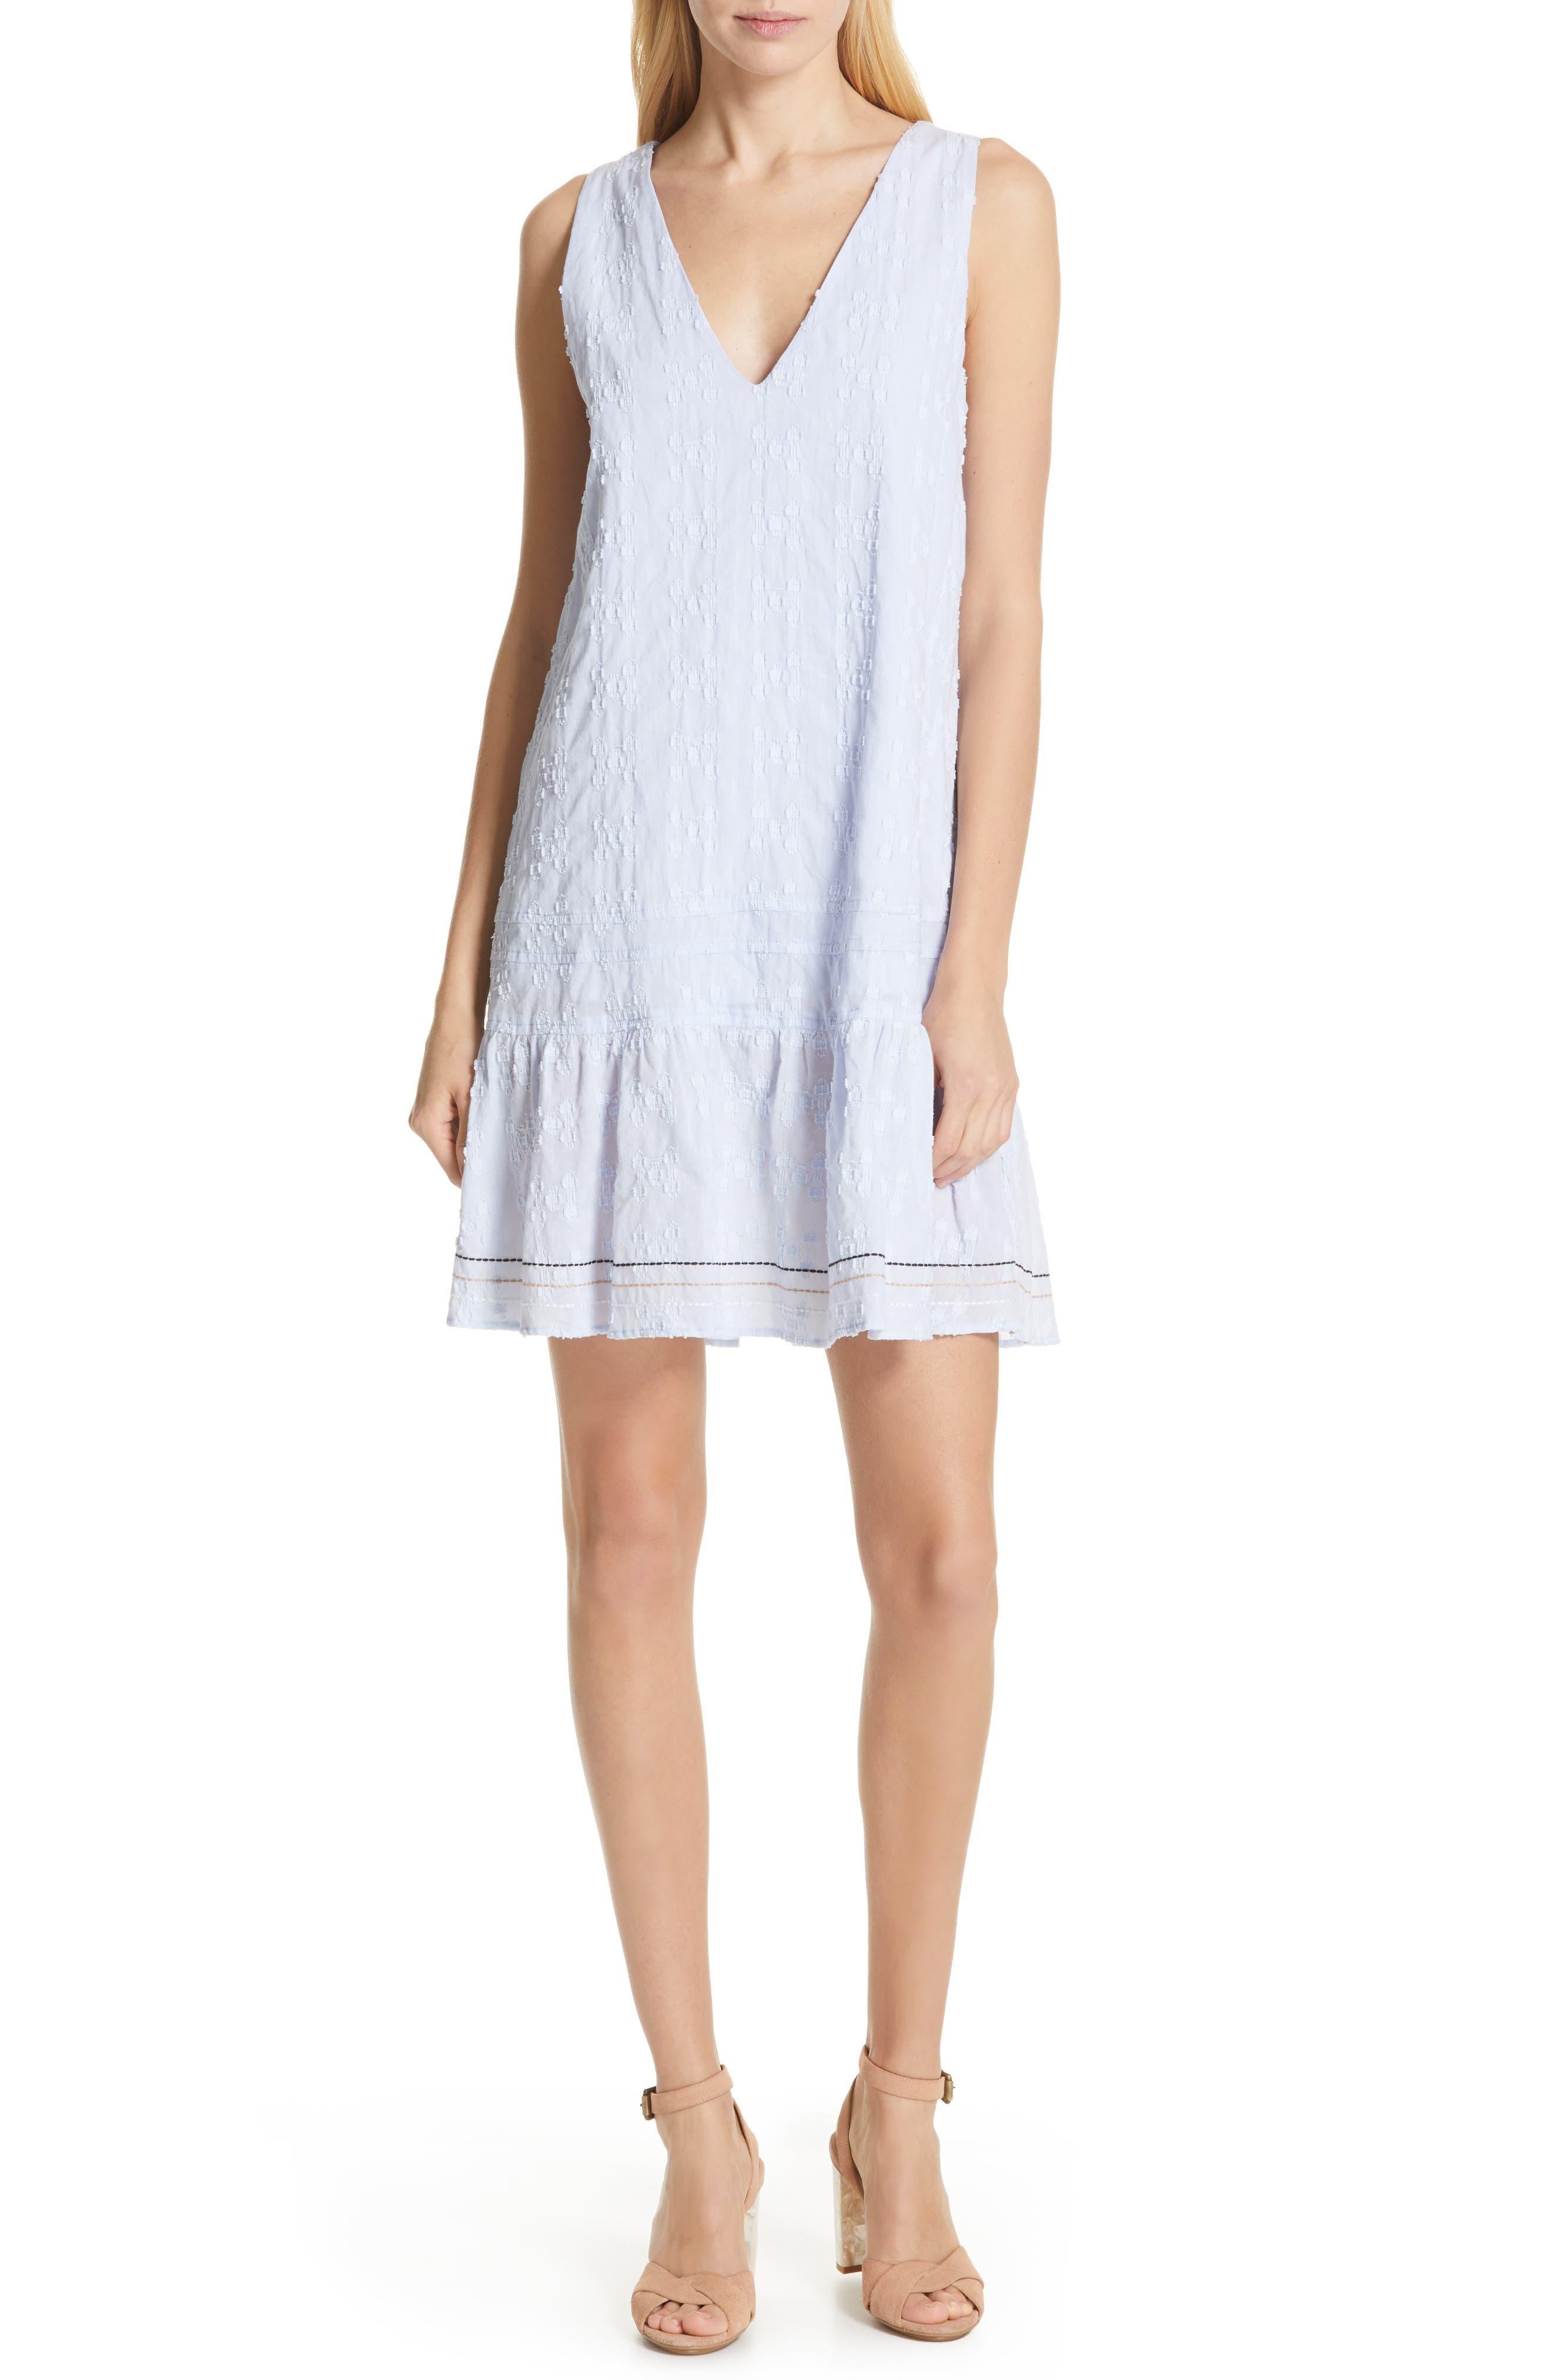 Dolan Dresses